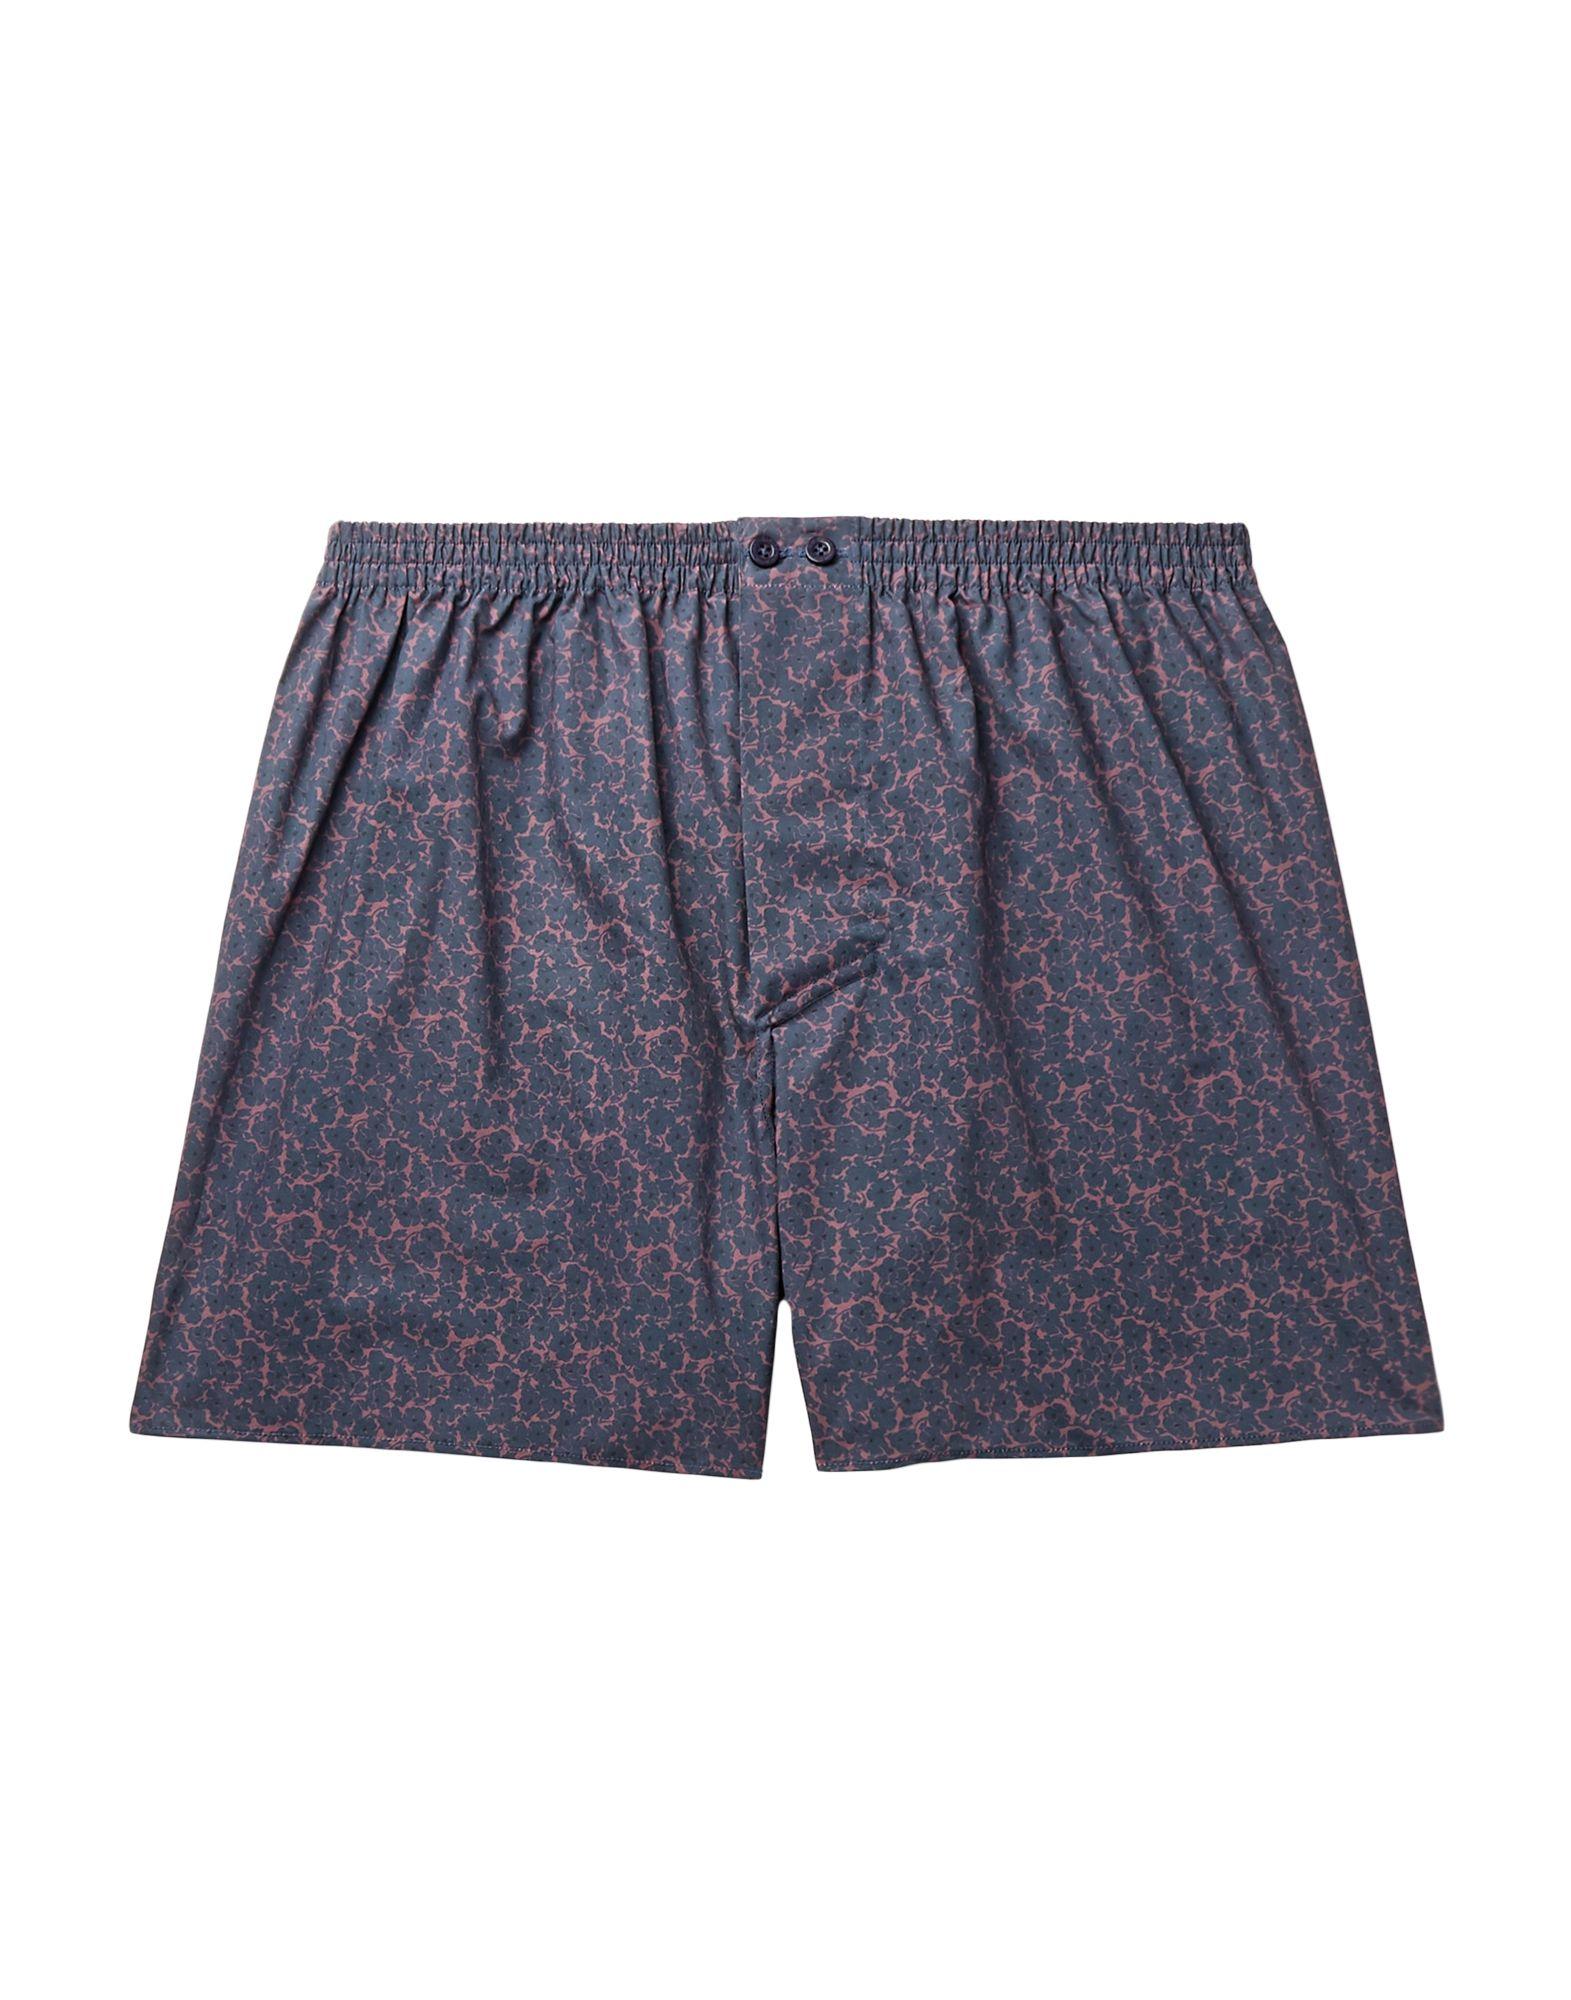 Фото - ZIMMERLI Пляжные брюки и шорты b zimmerli tragwiderstand von hochhausern